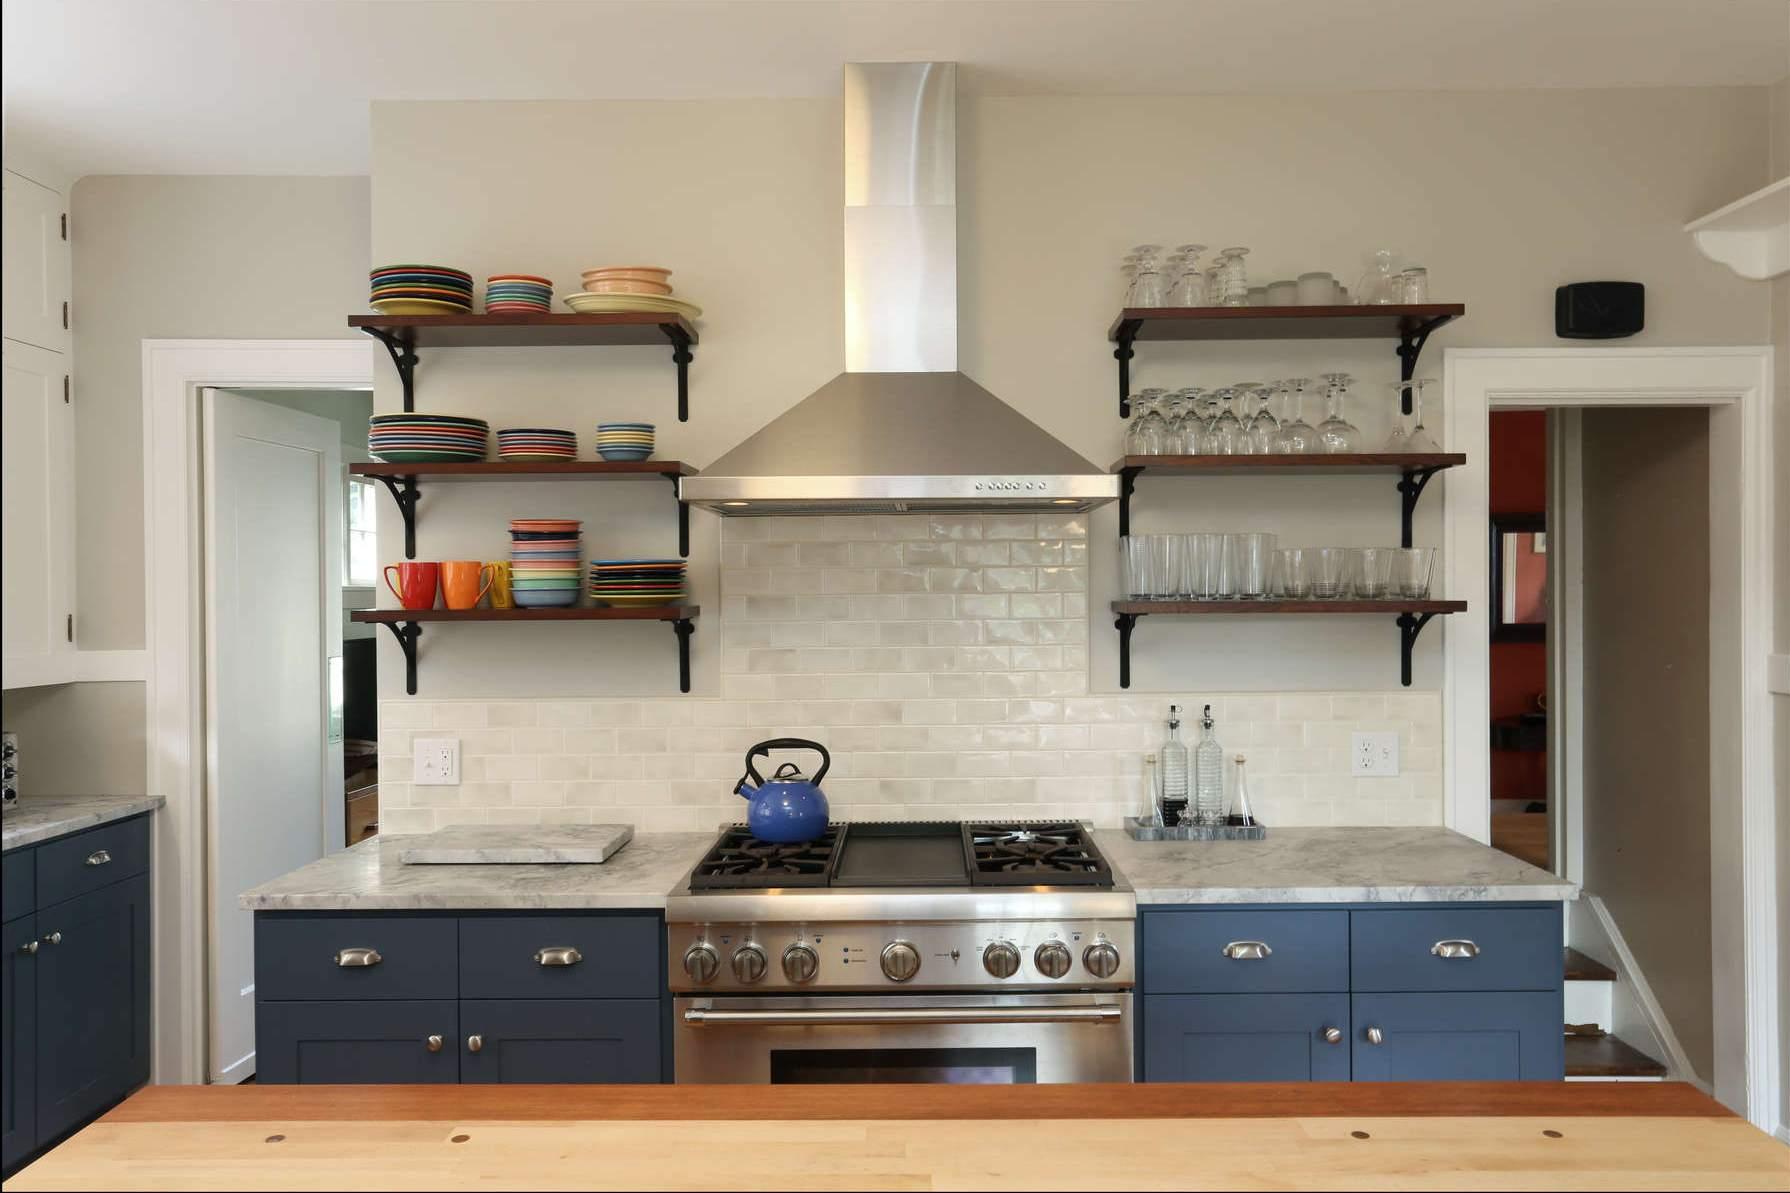 gabinetes de cocina retro-1922-azul